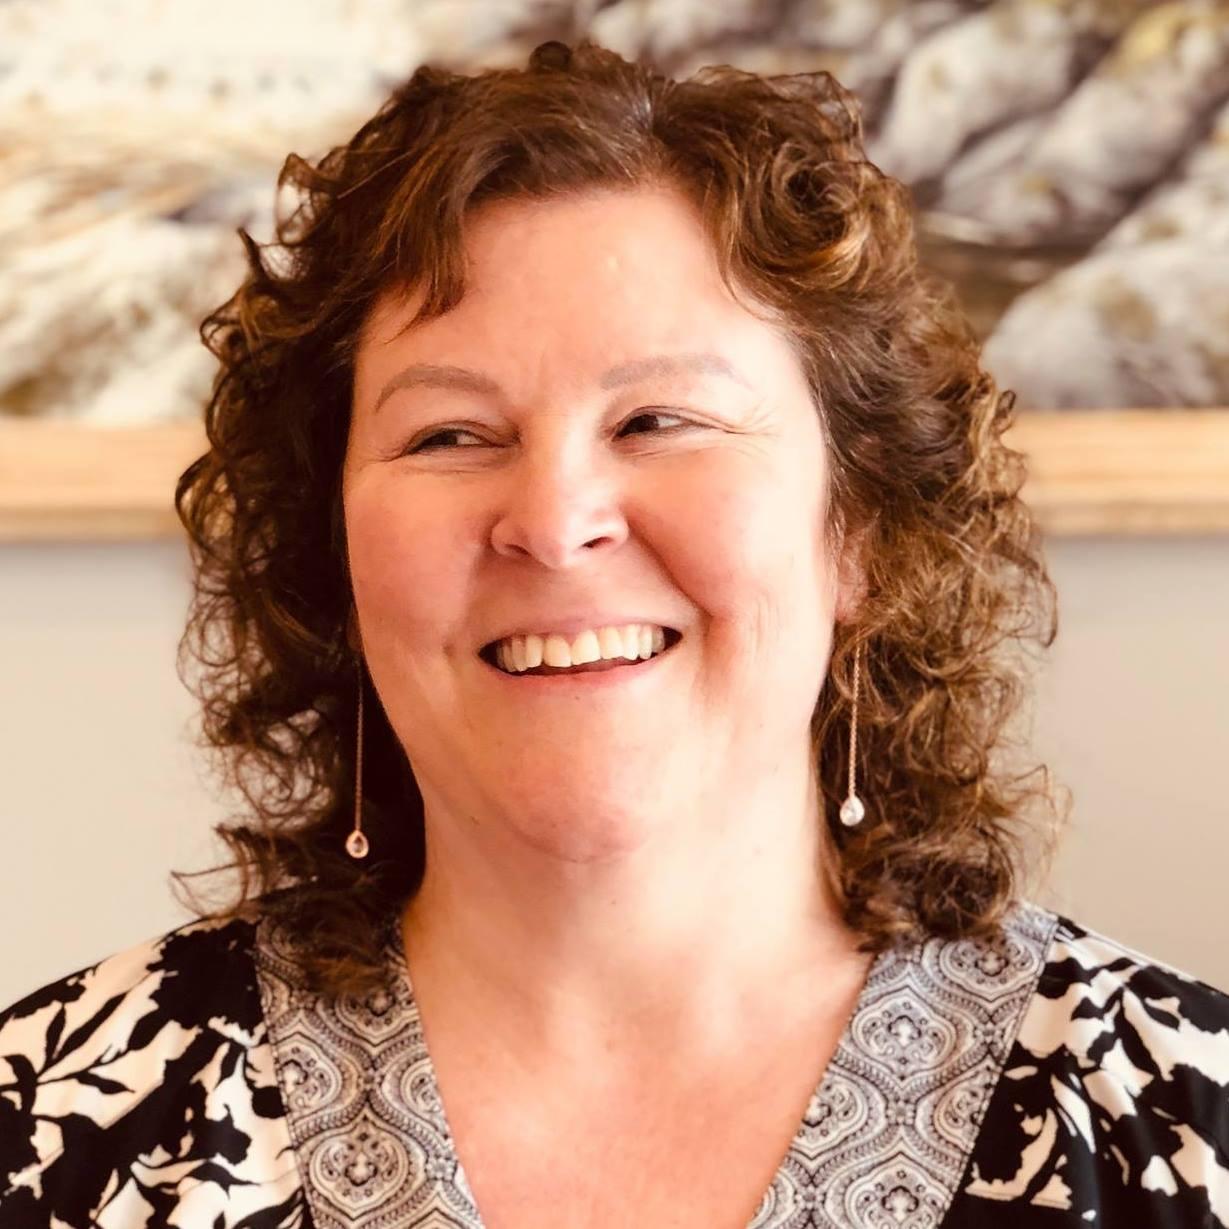 Dr. Lesa M. Seales Female Chiropractor